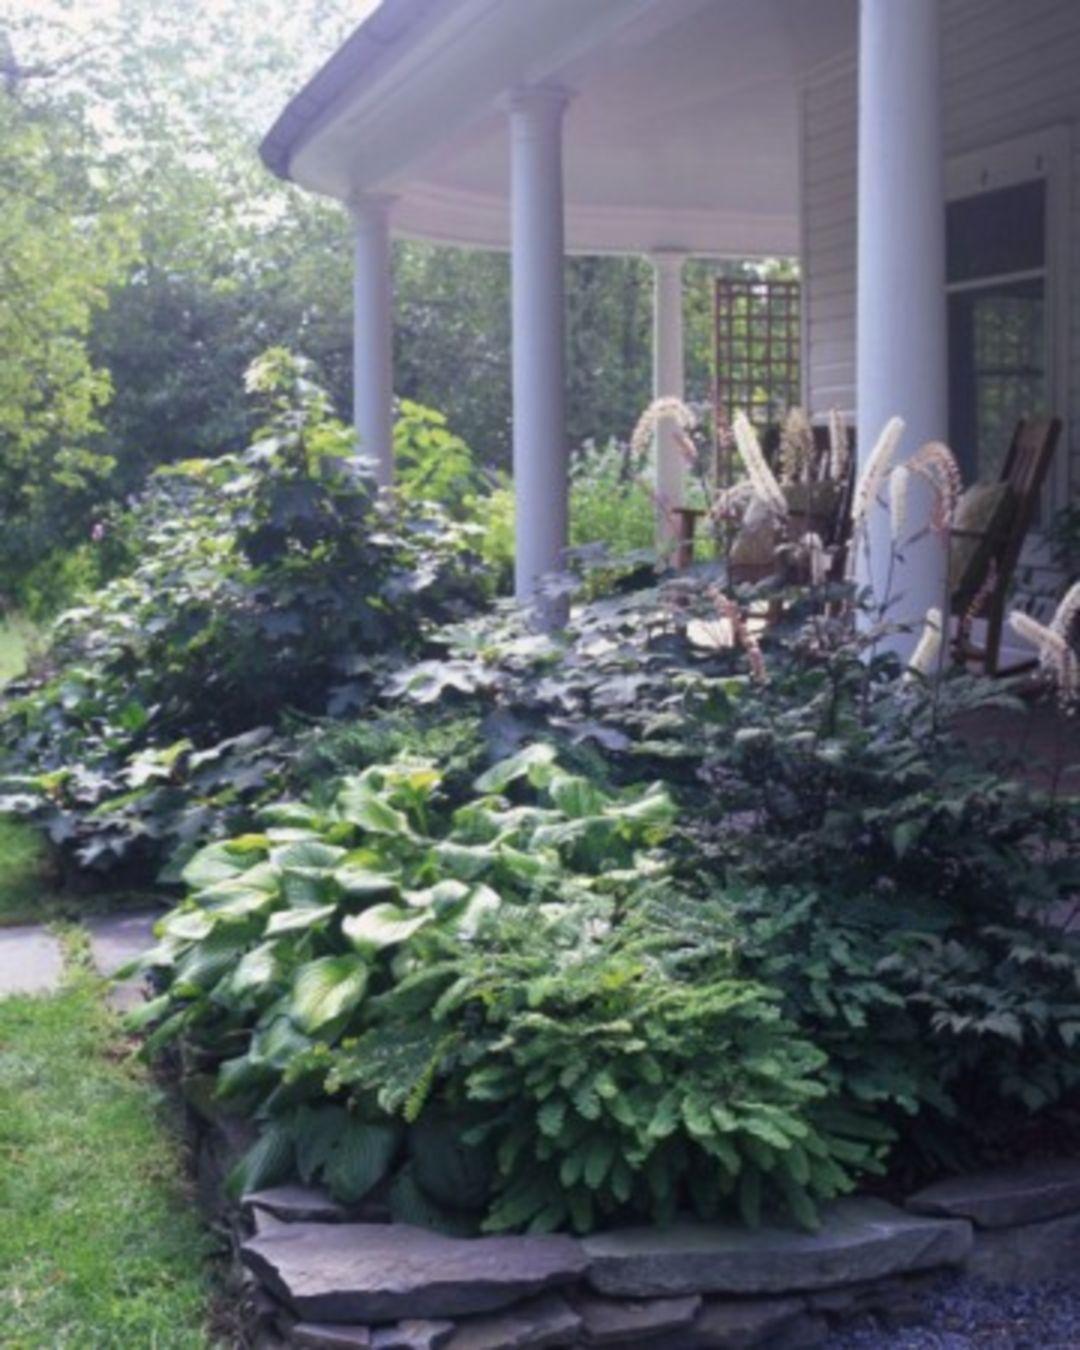 Inspiring 85+ Fabulous Lush Garden Design Ideas To Make Your Yard Awesome https://freshoom.com/11007-85-fabulous-lush-garden-design-ideas-make-yard-awesome/